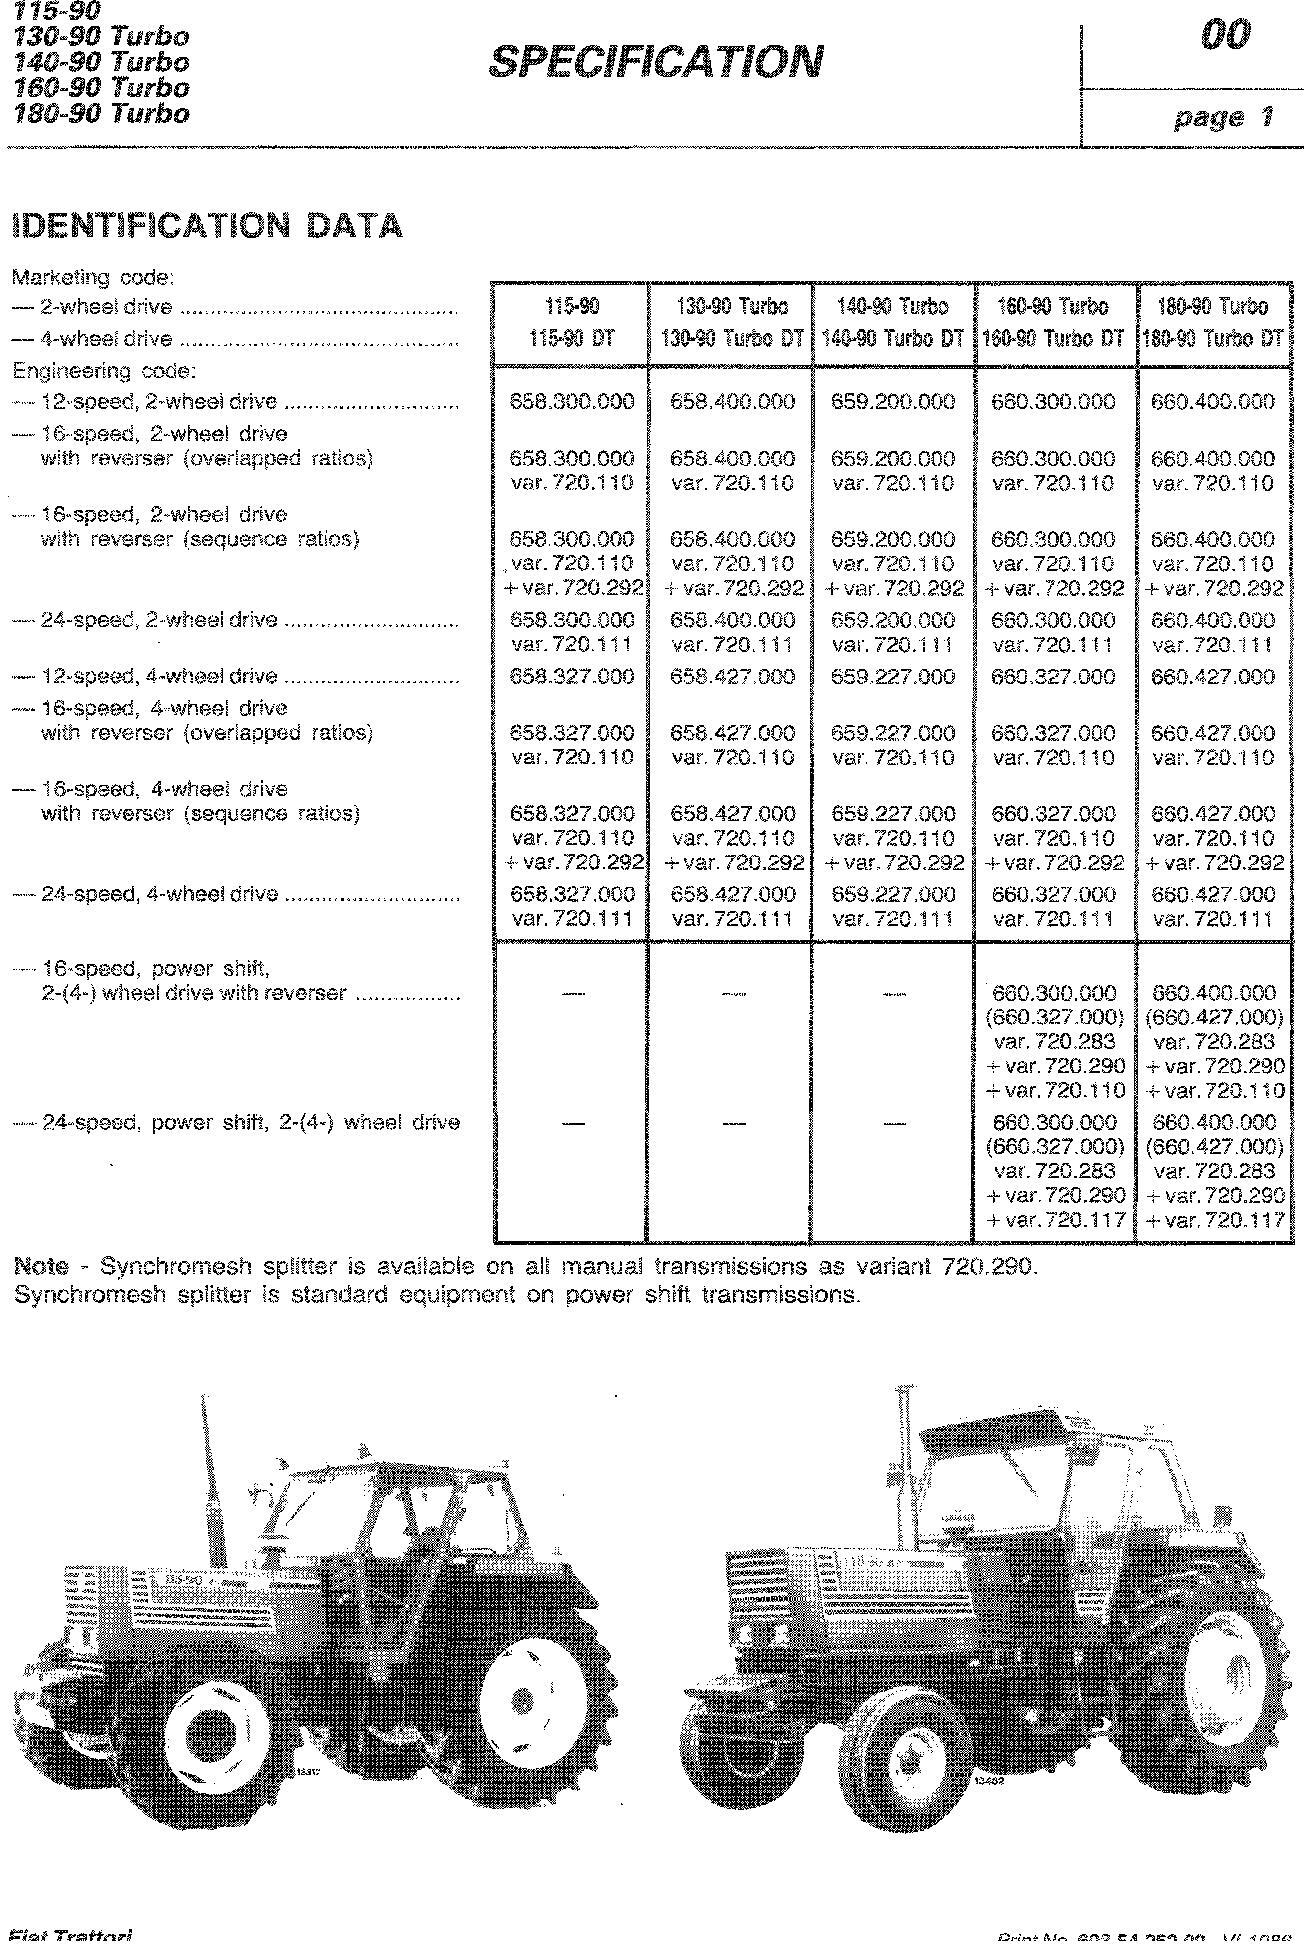 Fiat 115-90, 130-90, 140-90, 160-90, 180-90 Turbo Tractor Service Manual - 1